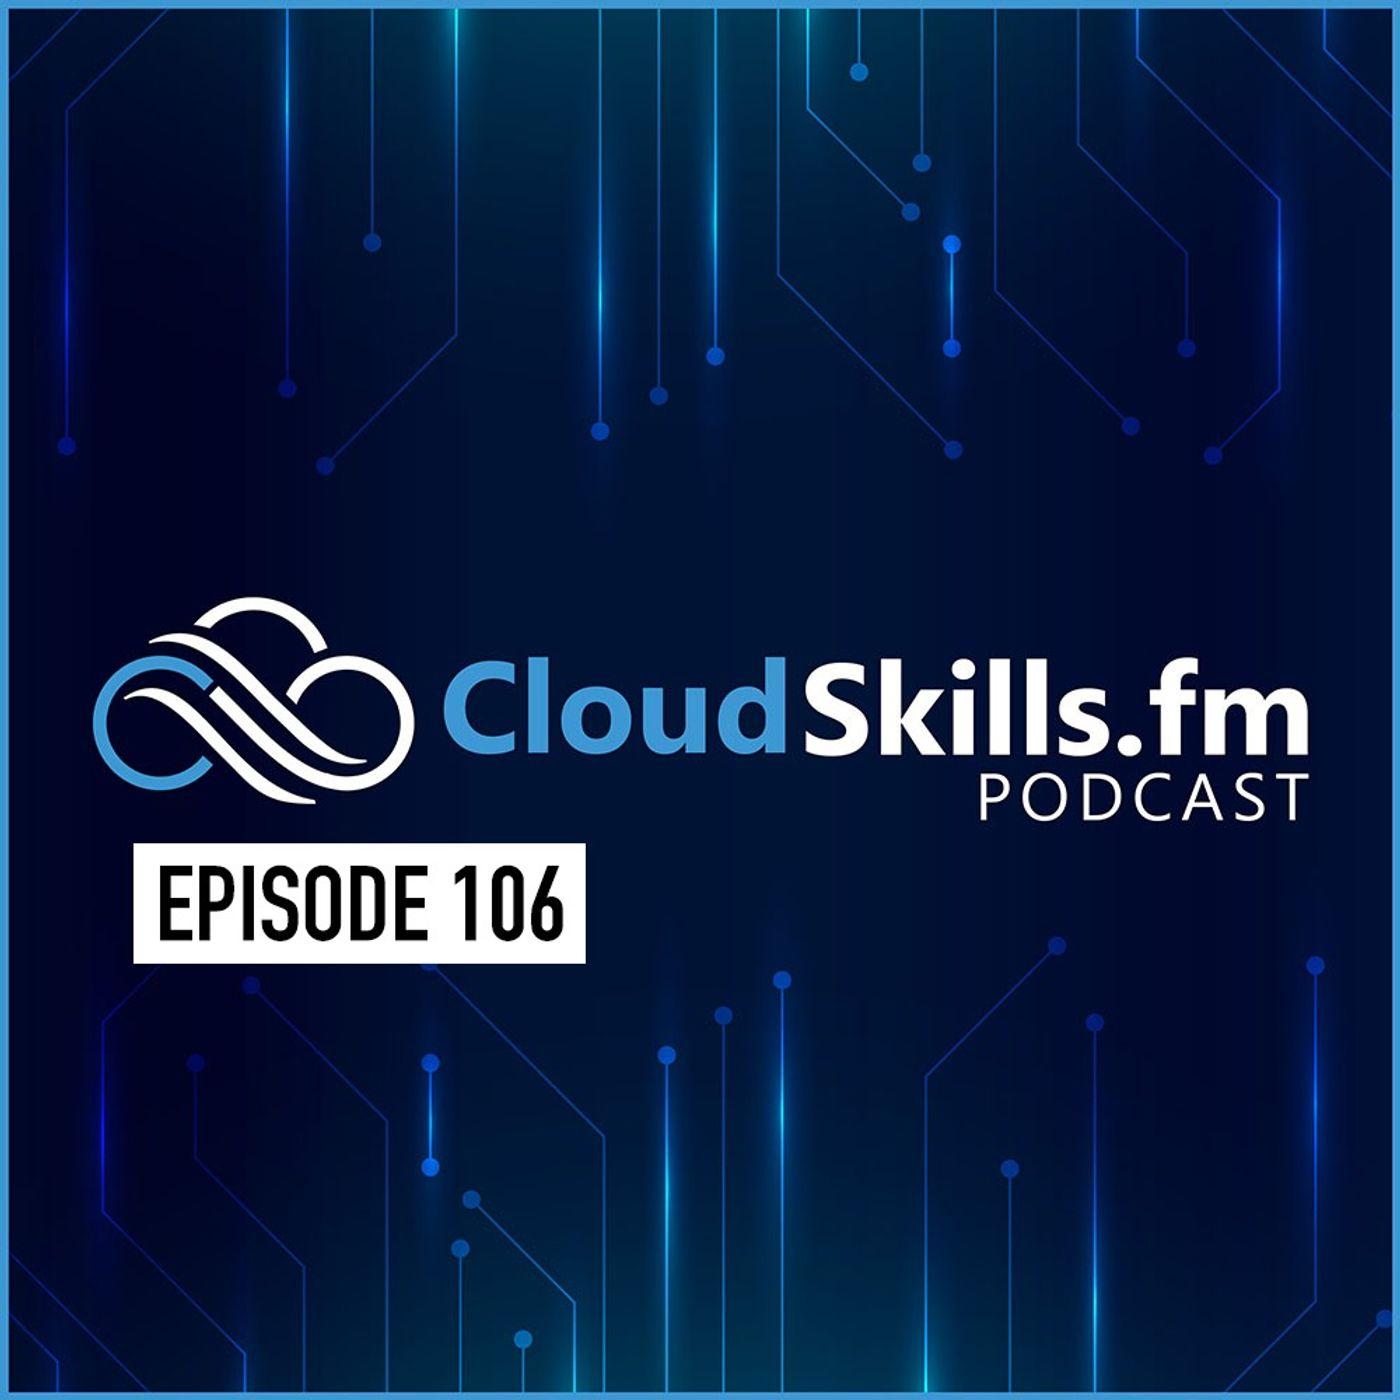 106: Steve Buchanan on Cloud Native, DevOps, GitOps, Kubernetes, and Azure